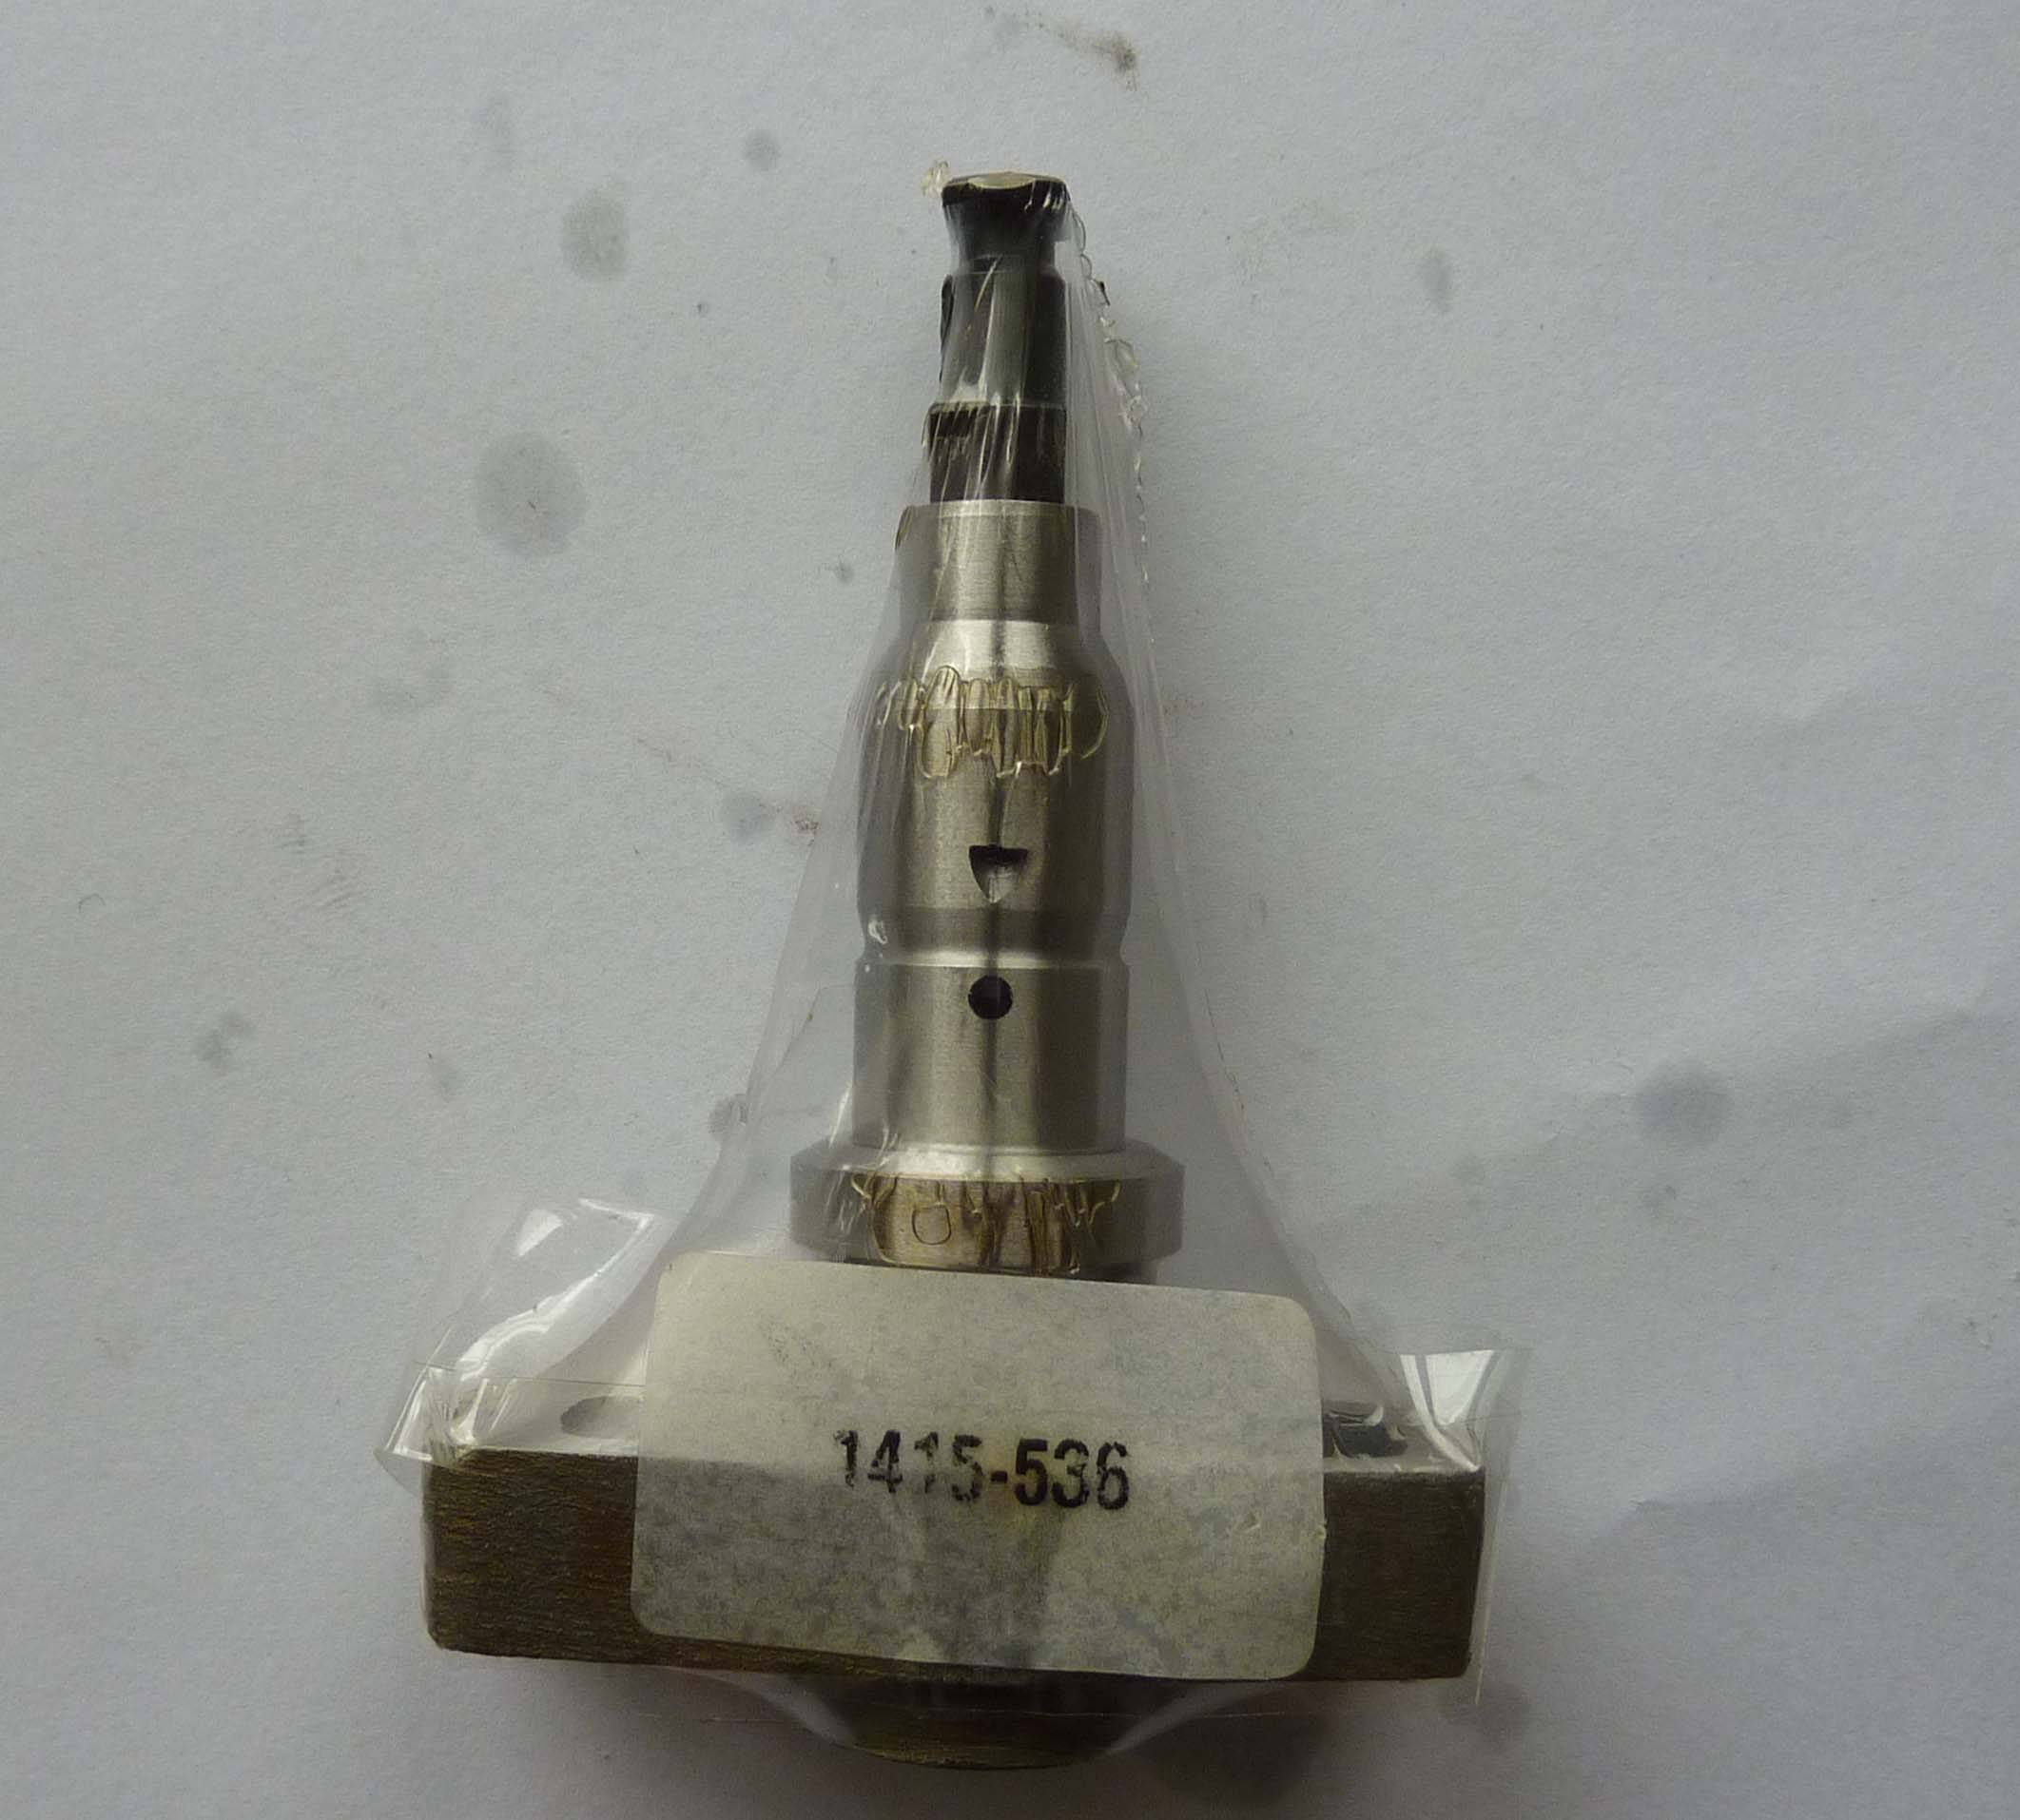 Diesel Fuel Injection Spare Parts(Diesel Plunger 1415-536)